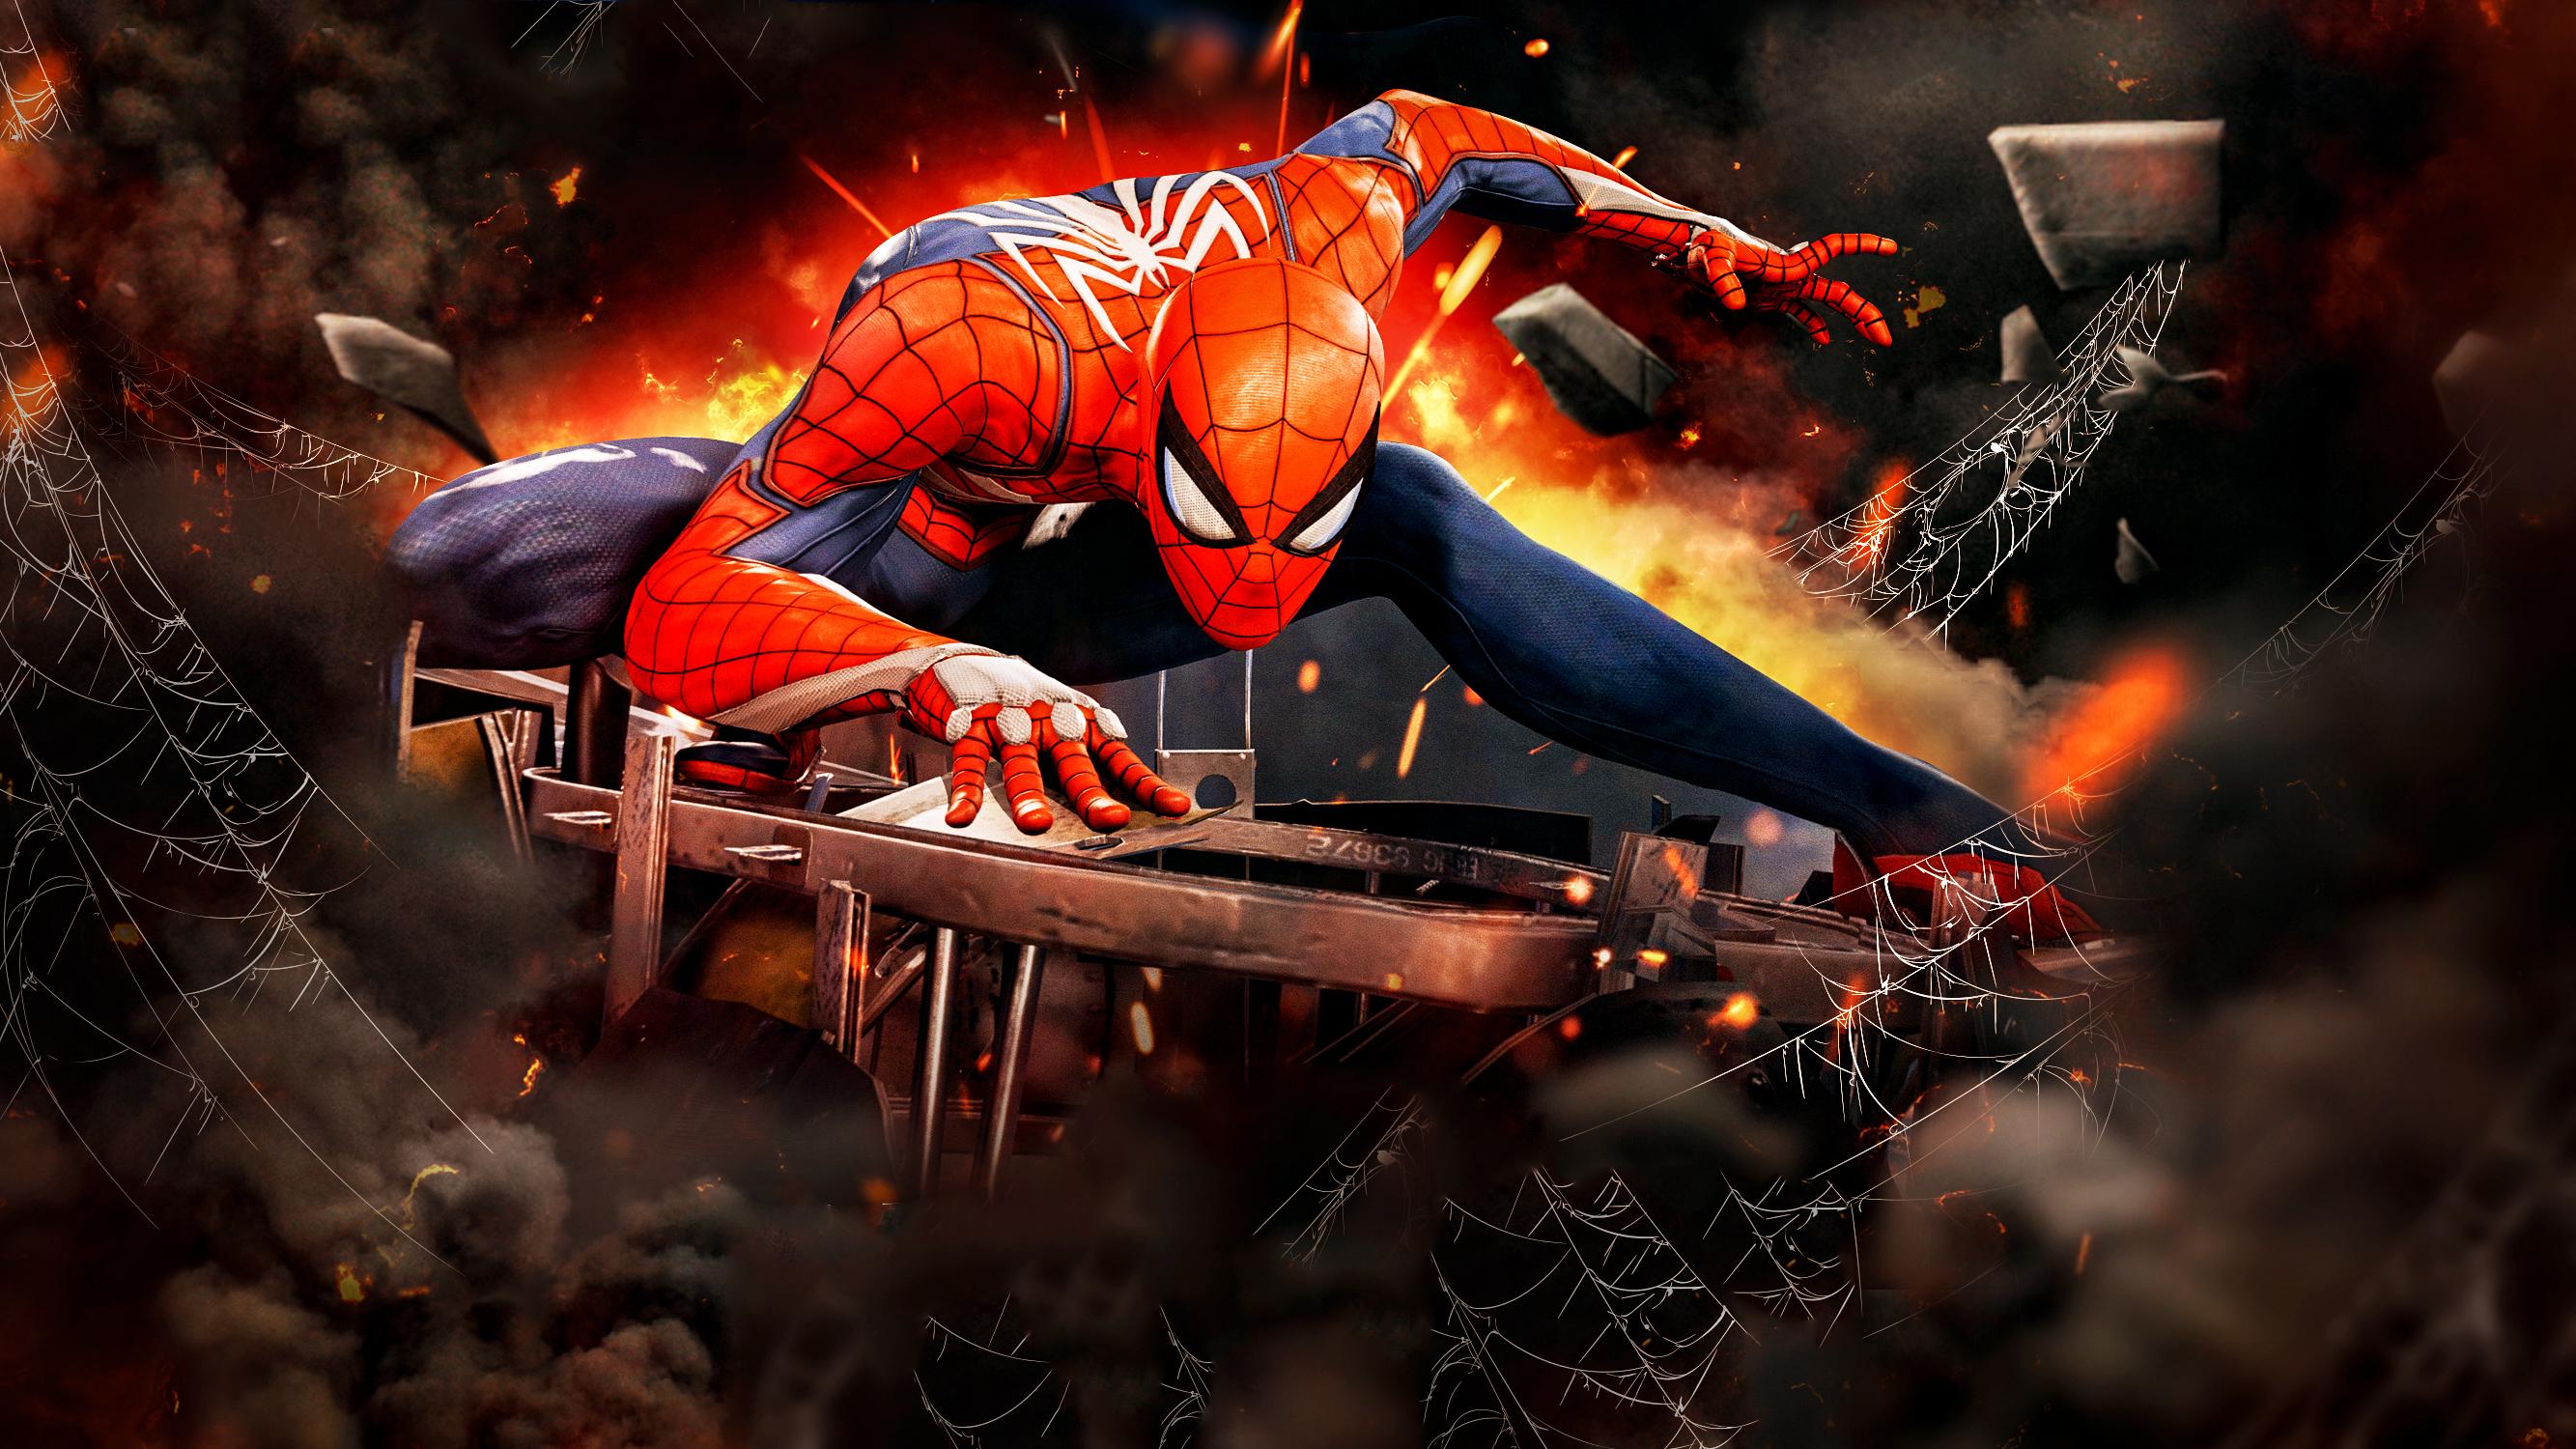 2560x1080 Final Fantasy Xv Ps4 2560x1080 Resolution Hd 4k: 2560x1080 Spiderman Ps4 Game Artwork 2560x1080 Resolution